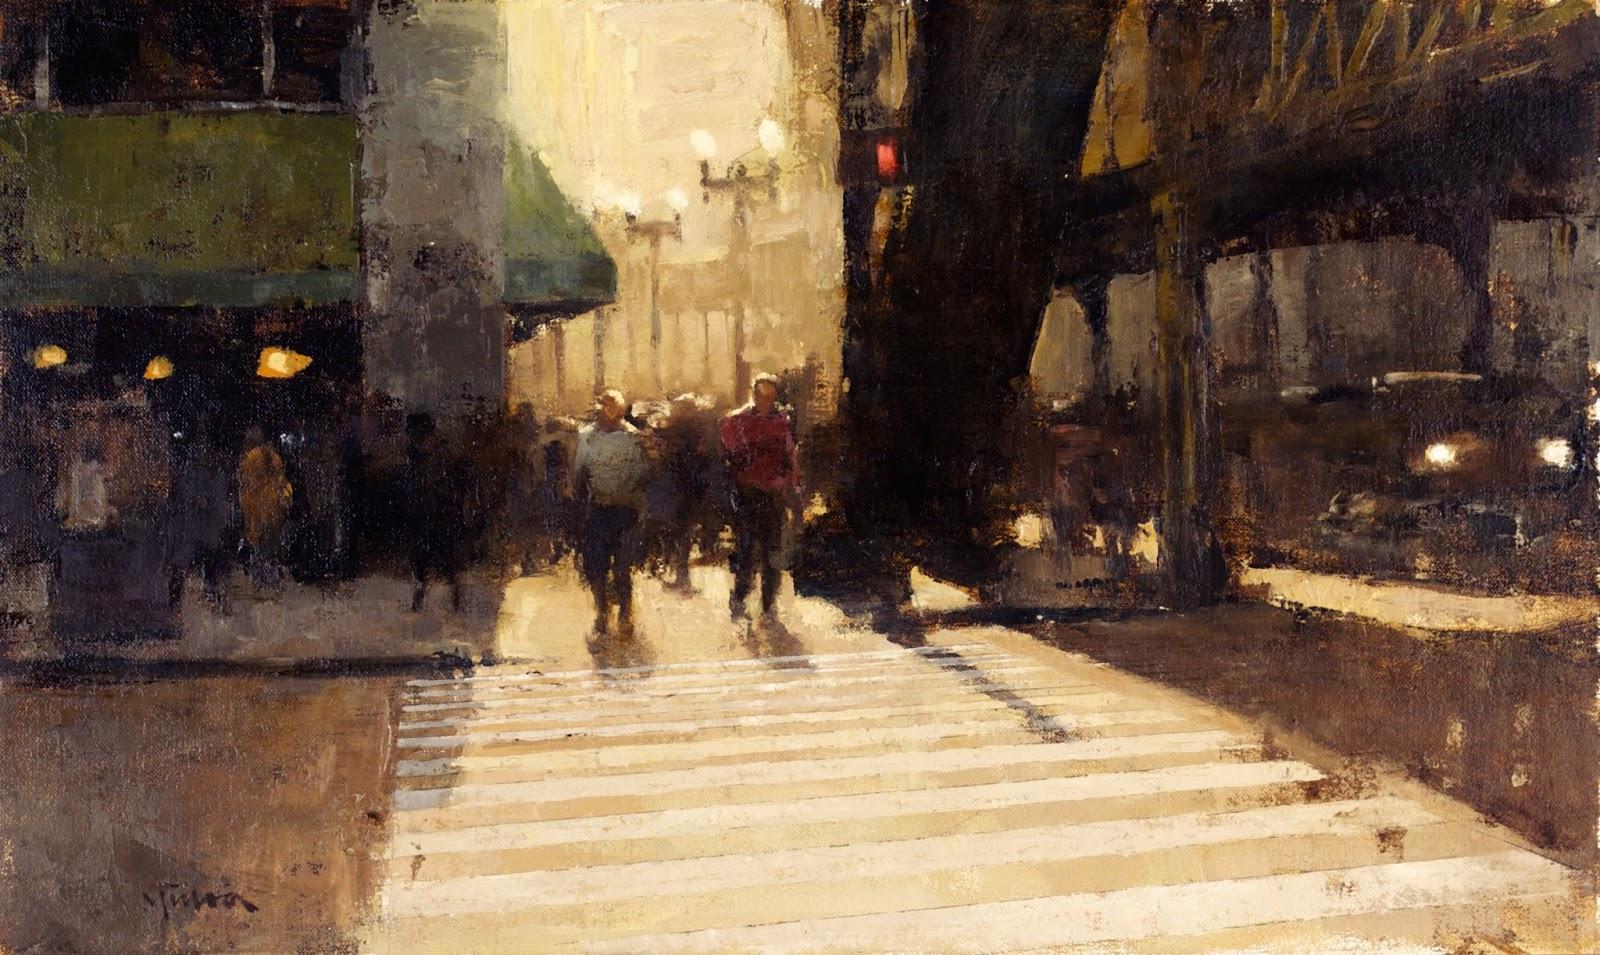 Crosswalk Shadows, 12x19, oil on linen